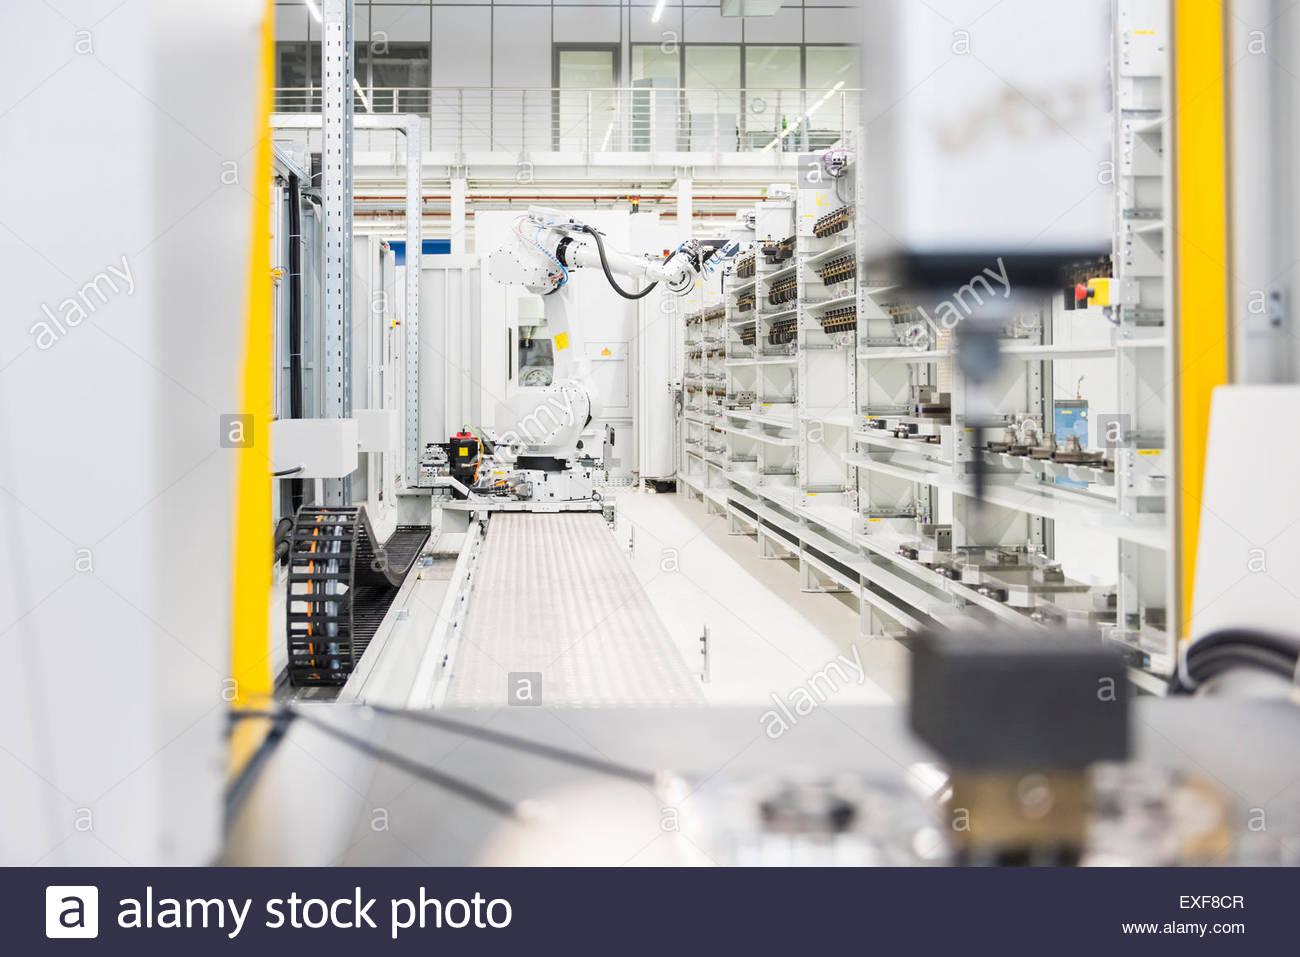 Factory conveyer belt on production line - Stock Image